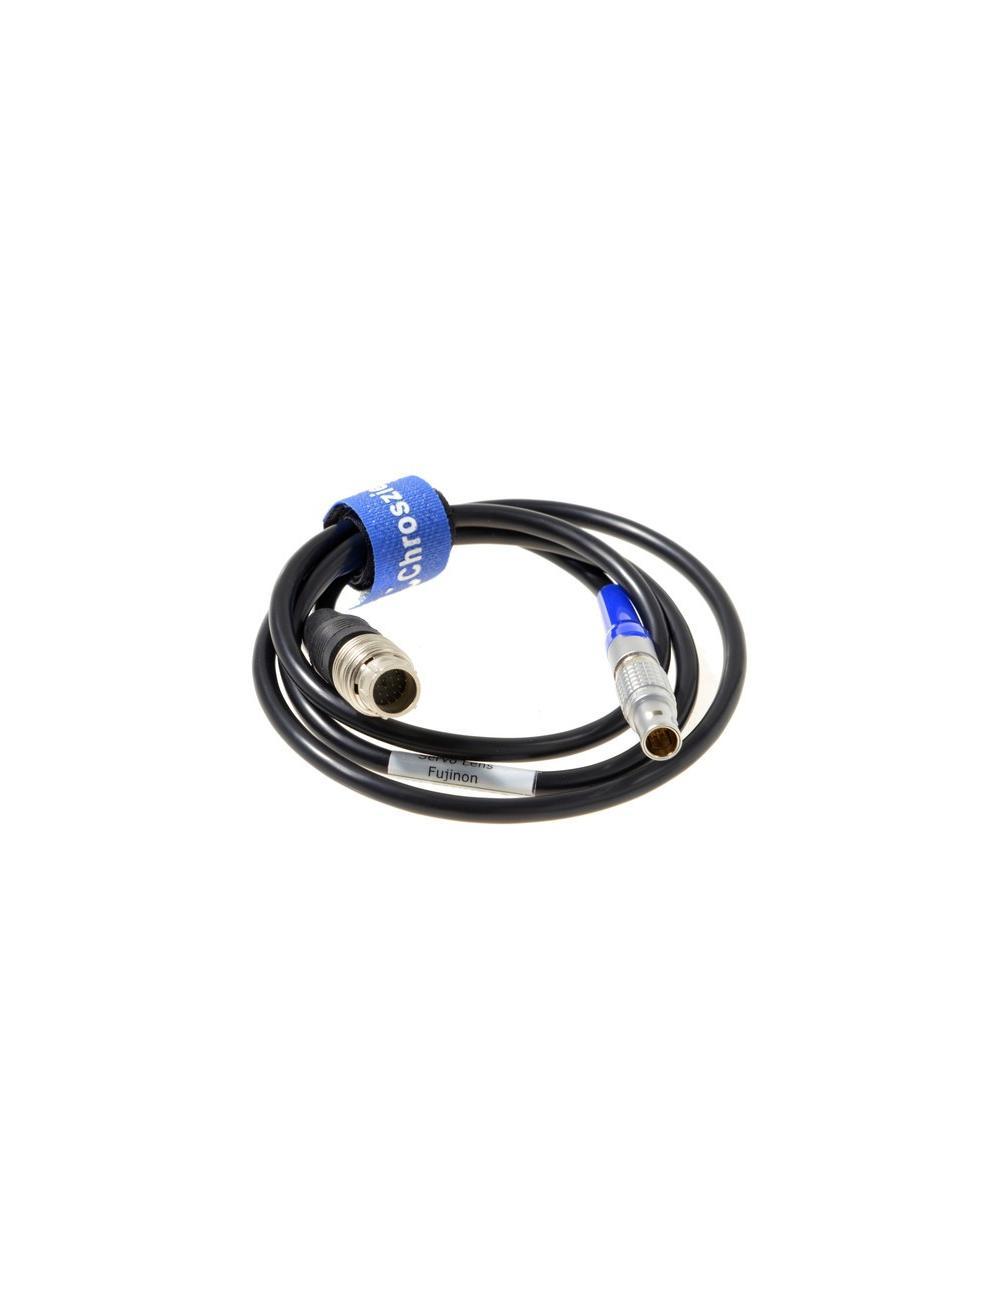 Chrosziel - Cable de control de servomotores Fujinon MN-FJN